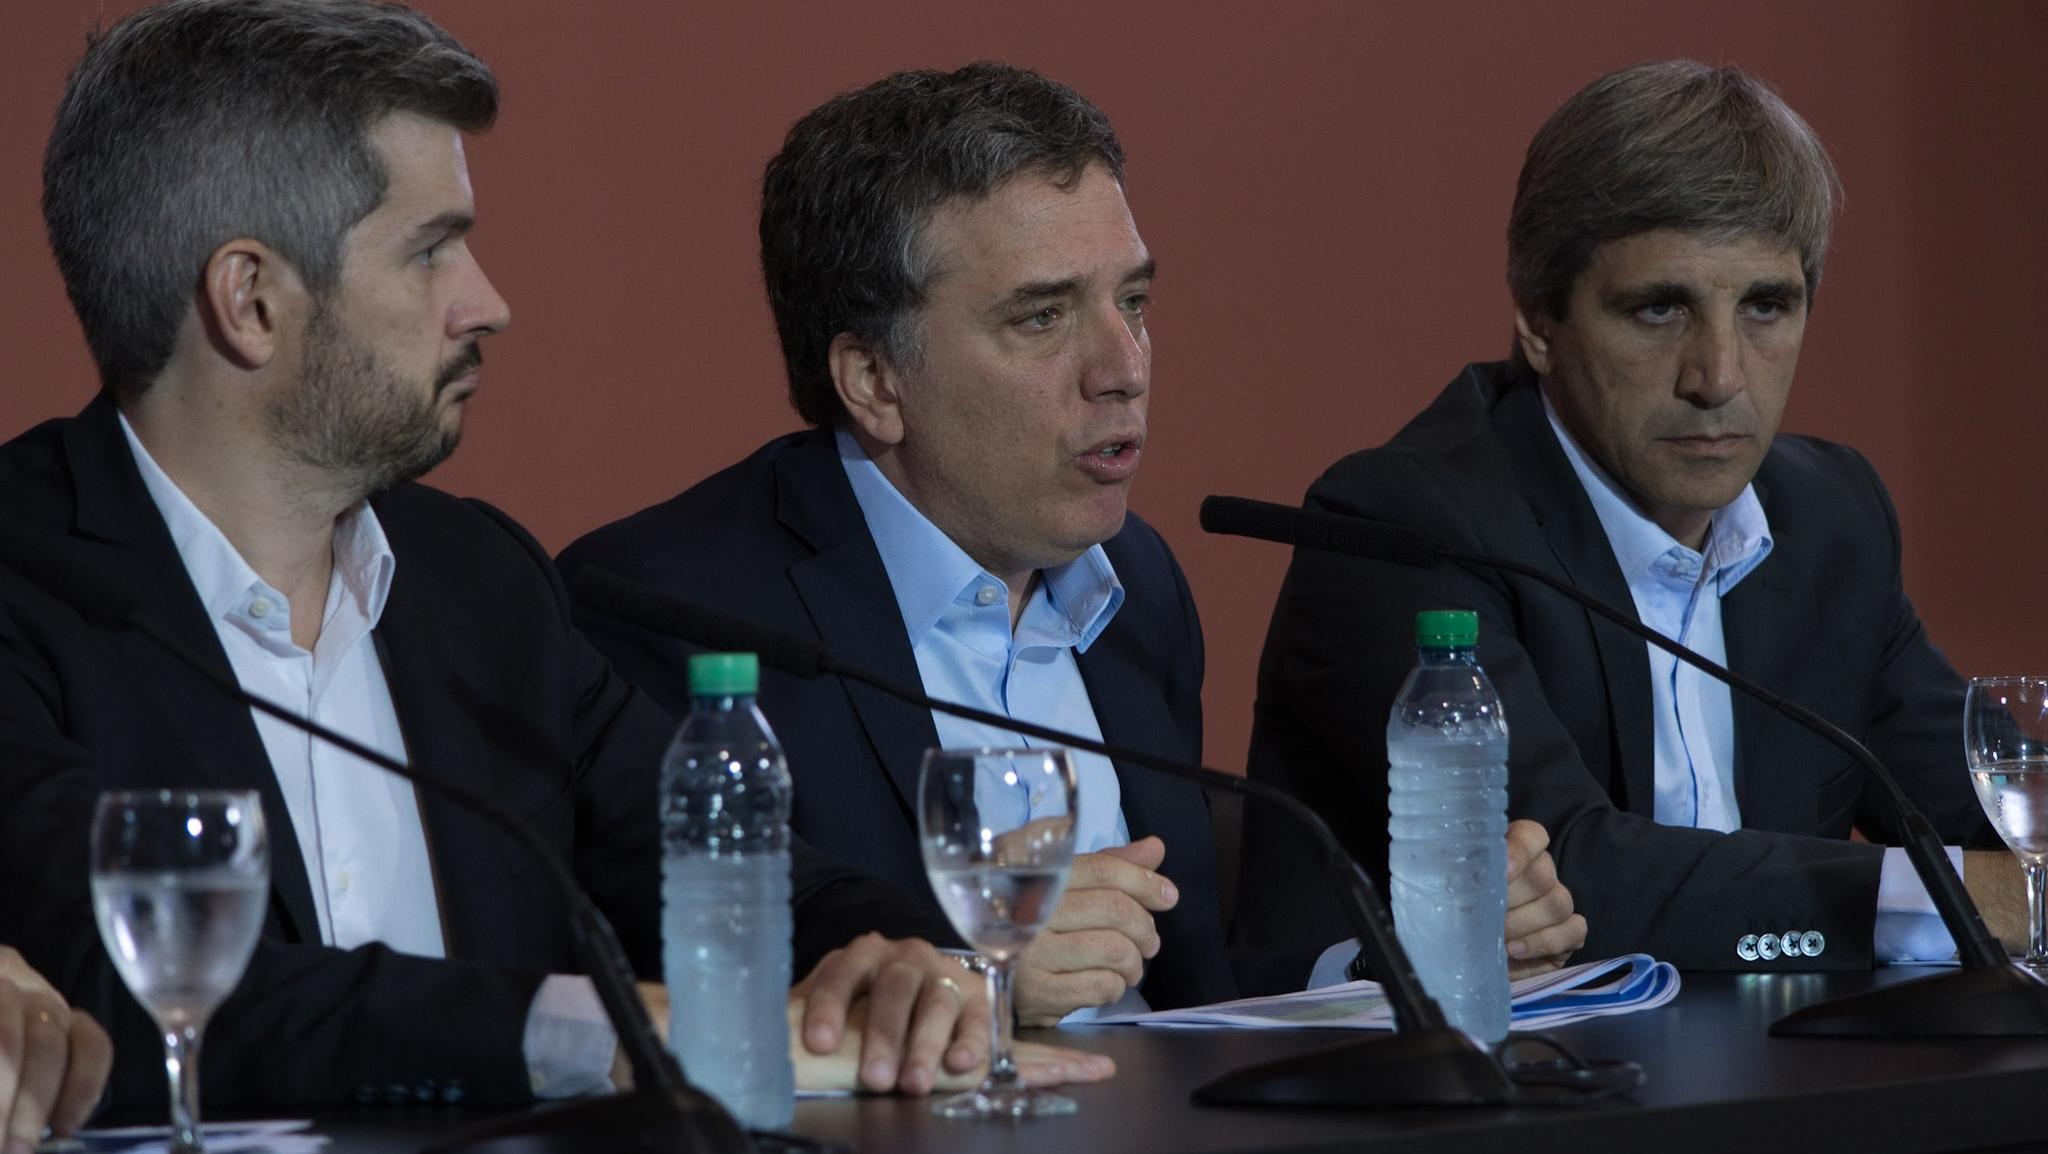 Conferencia de prensa de Peña,Dujovney Caputo. (Foto: Télam)